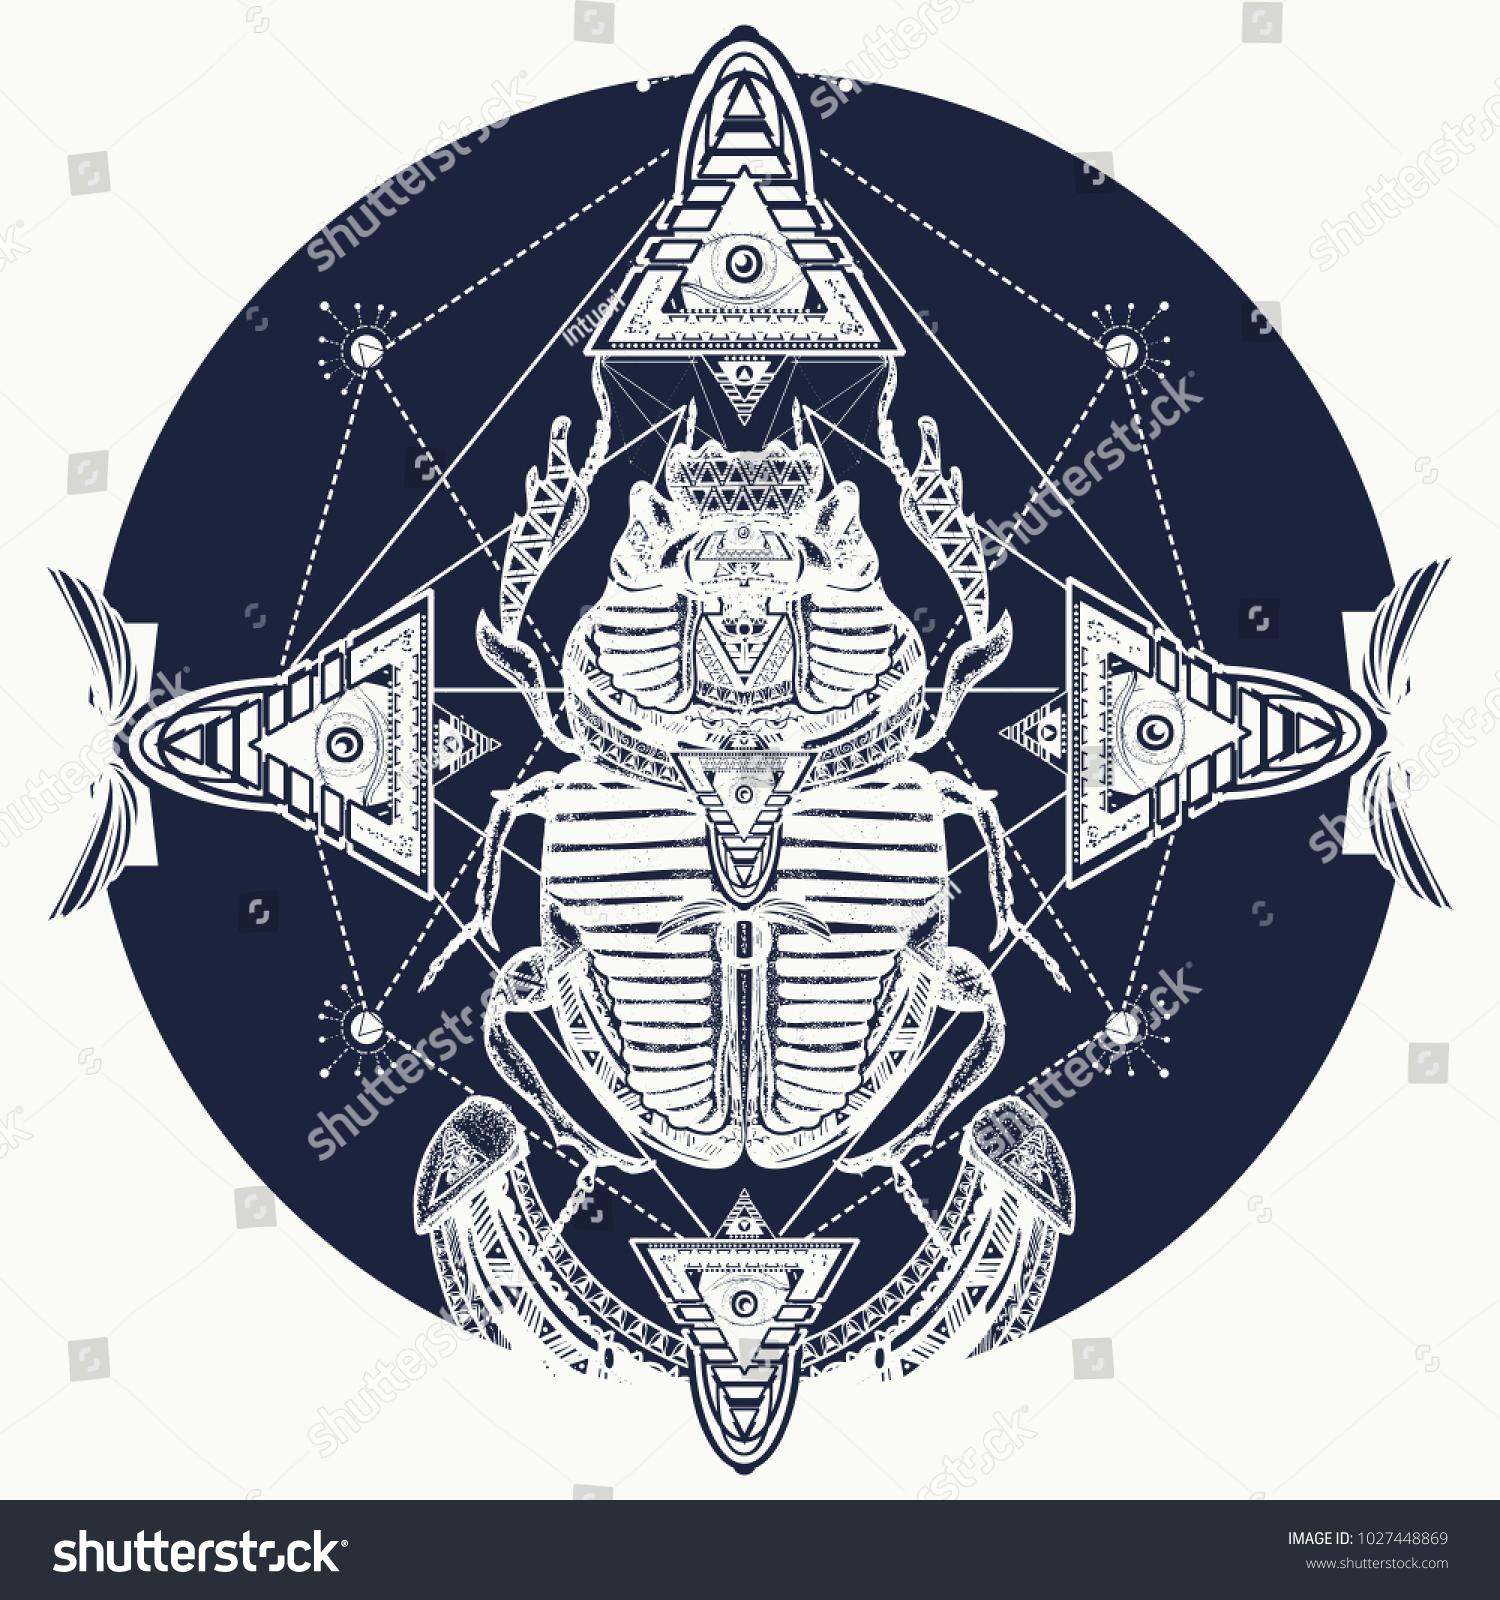 Egyptian god ra symbol gallery symbol and sign ideas egyptian scarab symbol pharaoh gods ra stock vector 1027448869 egyptian scarab symbol of pharaoh gods ra buycottarizona